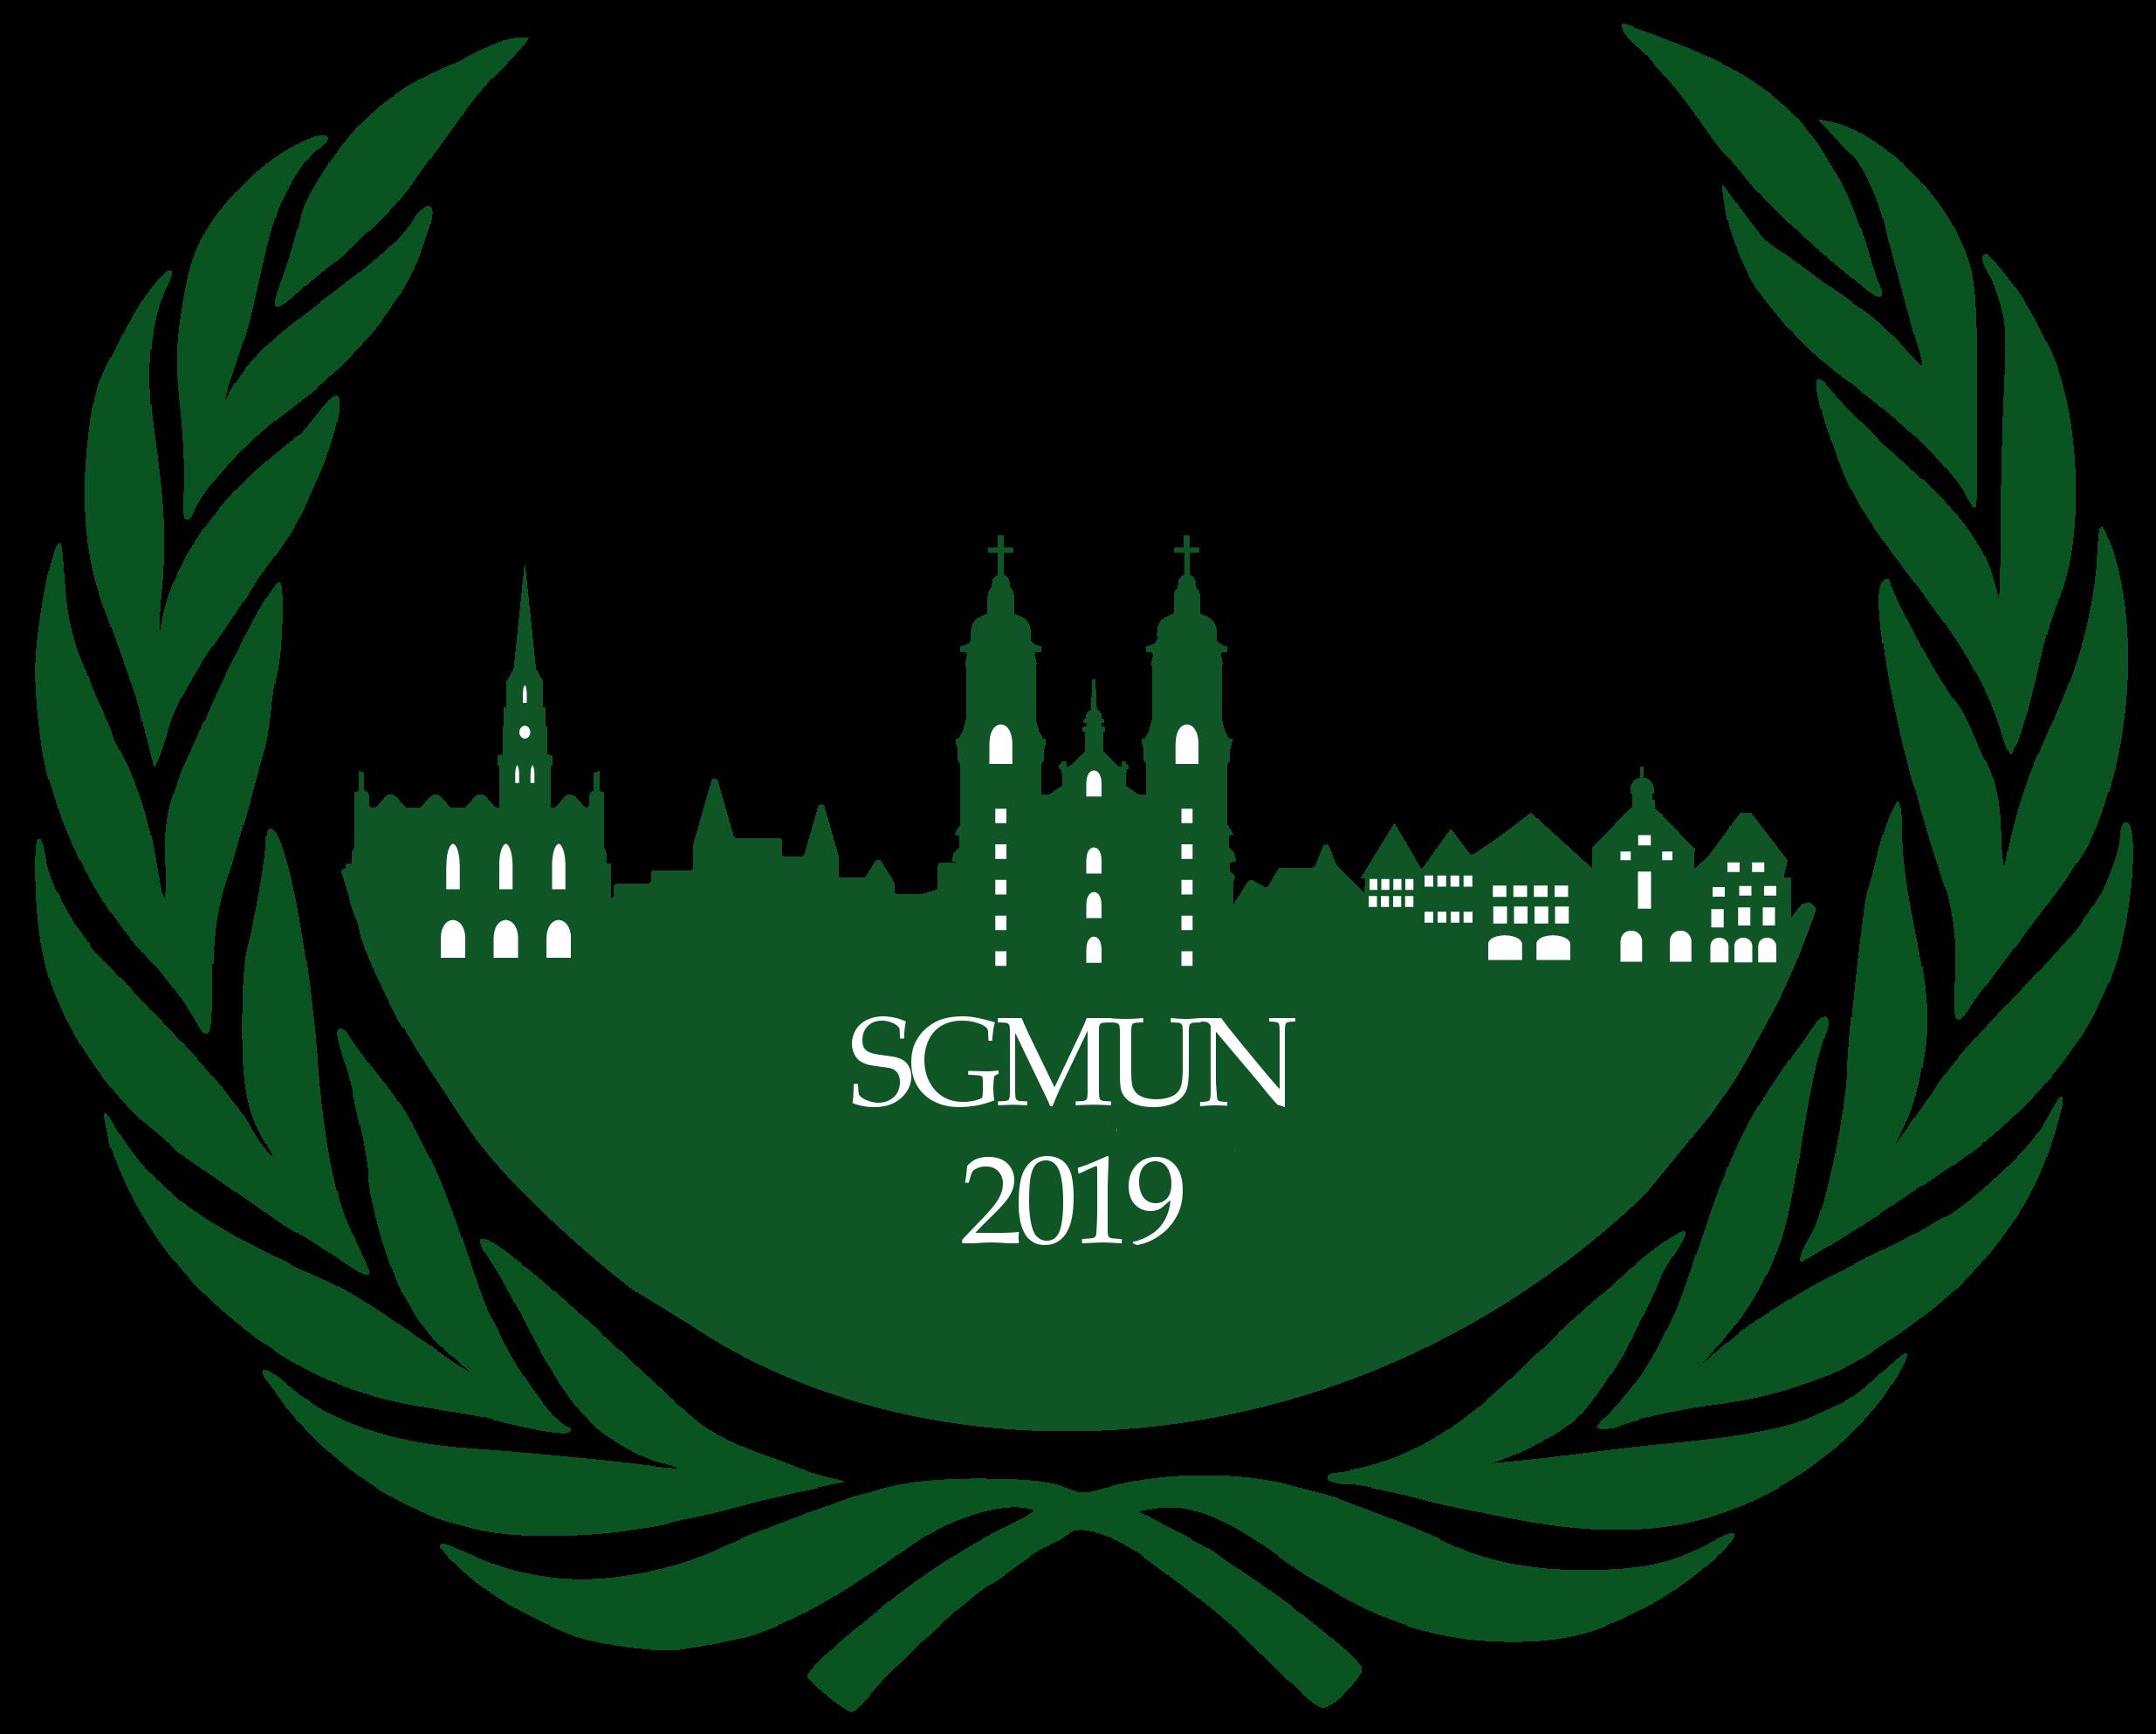 SGMUN 2019.png